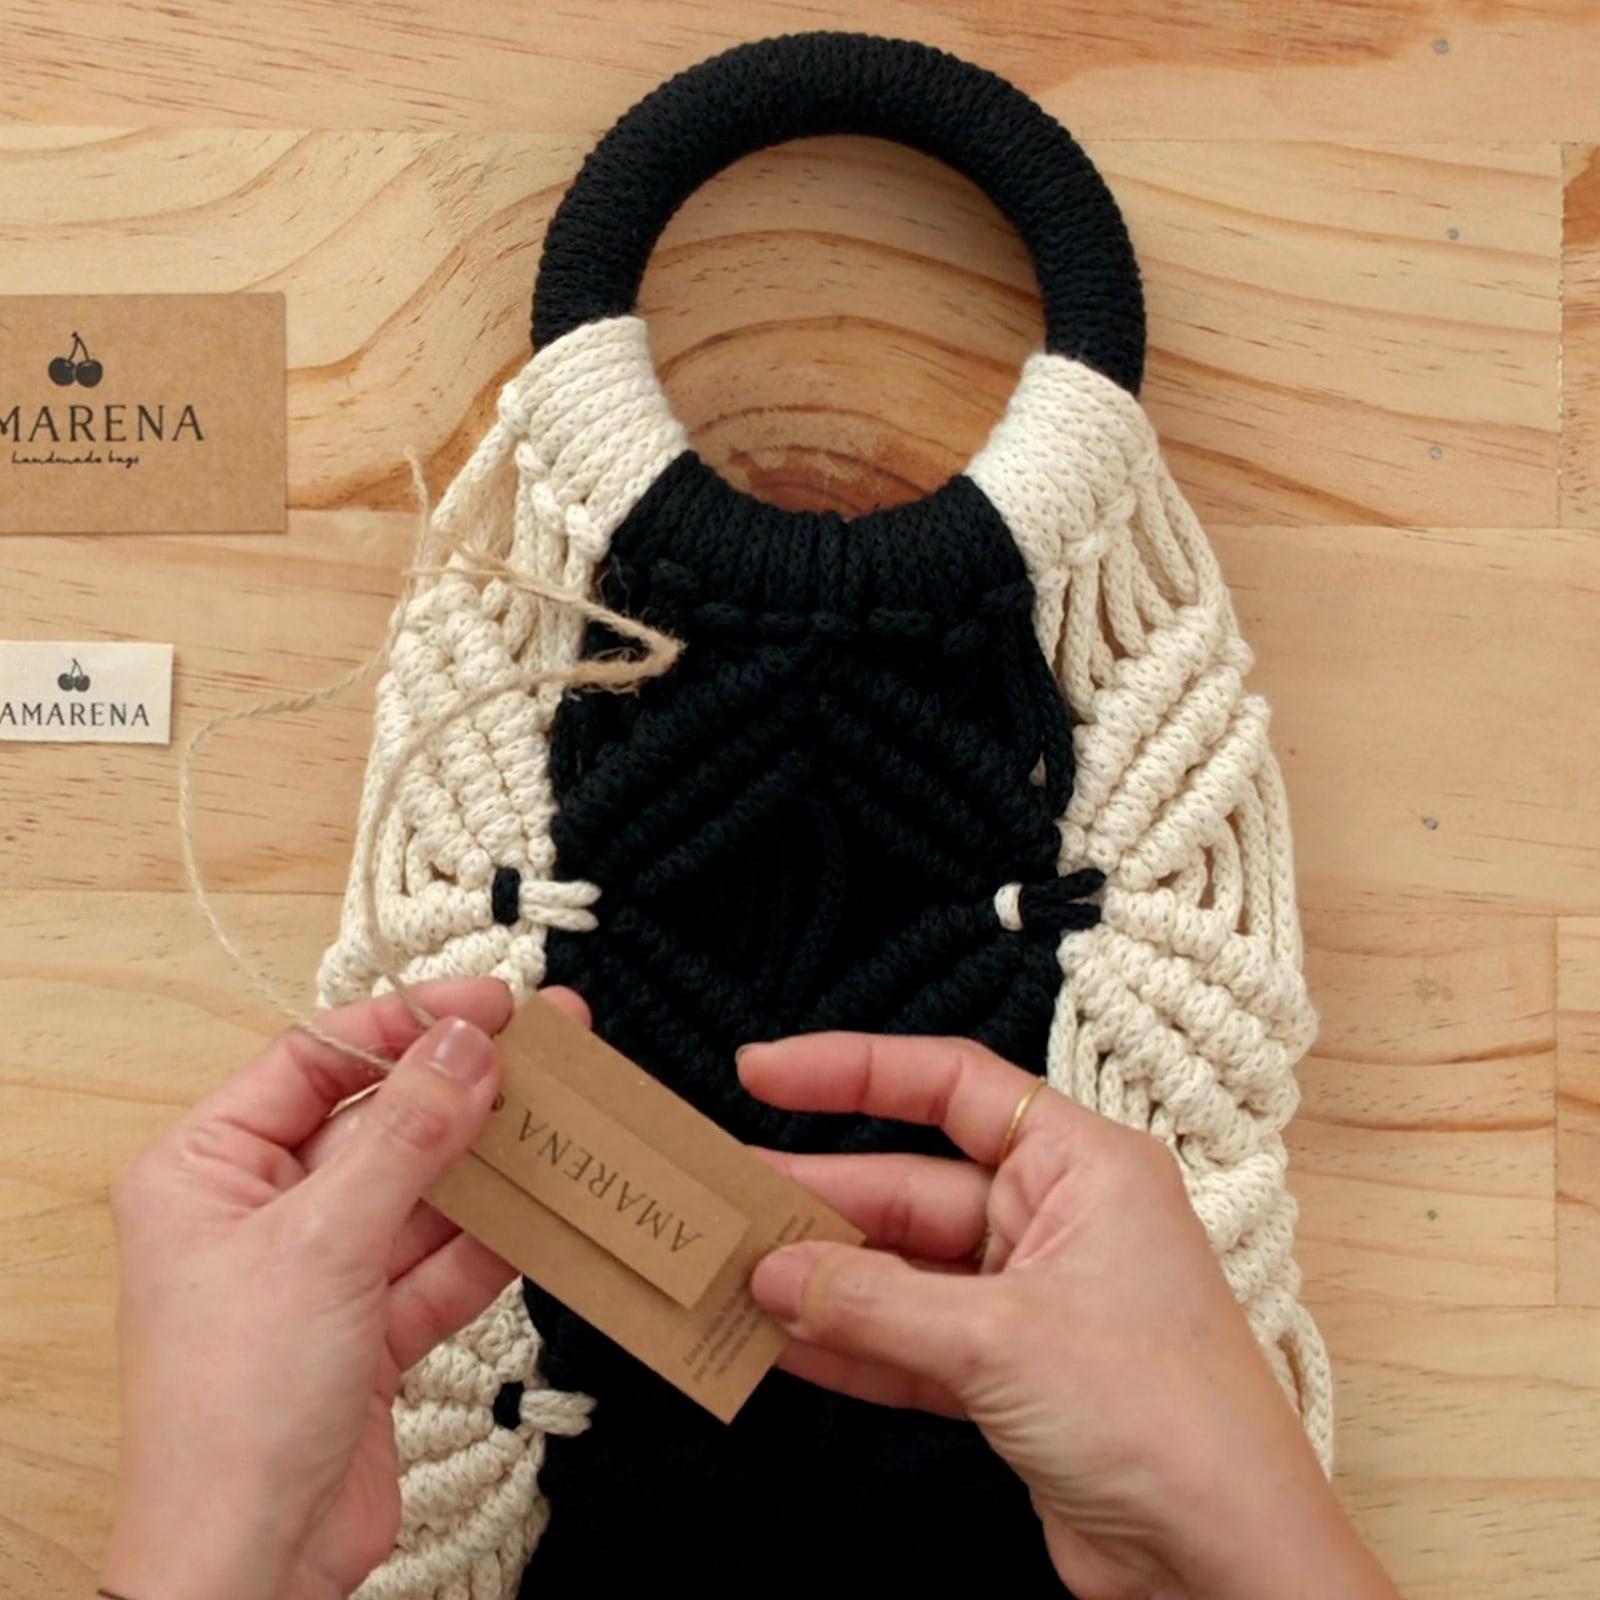 Tutorial Packaging: dicas para embalagens de artesanato